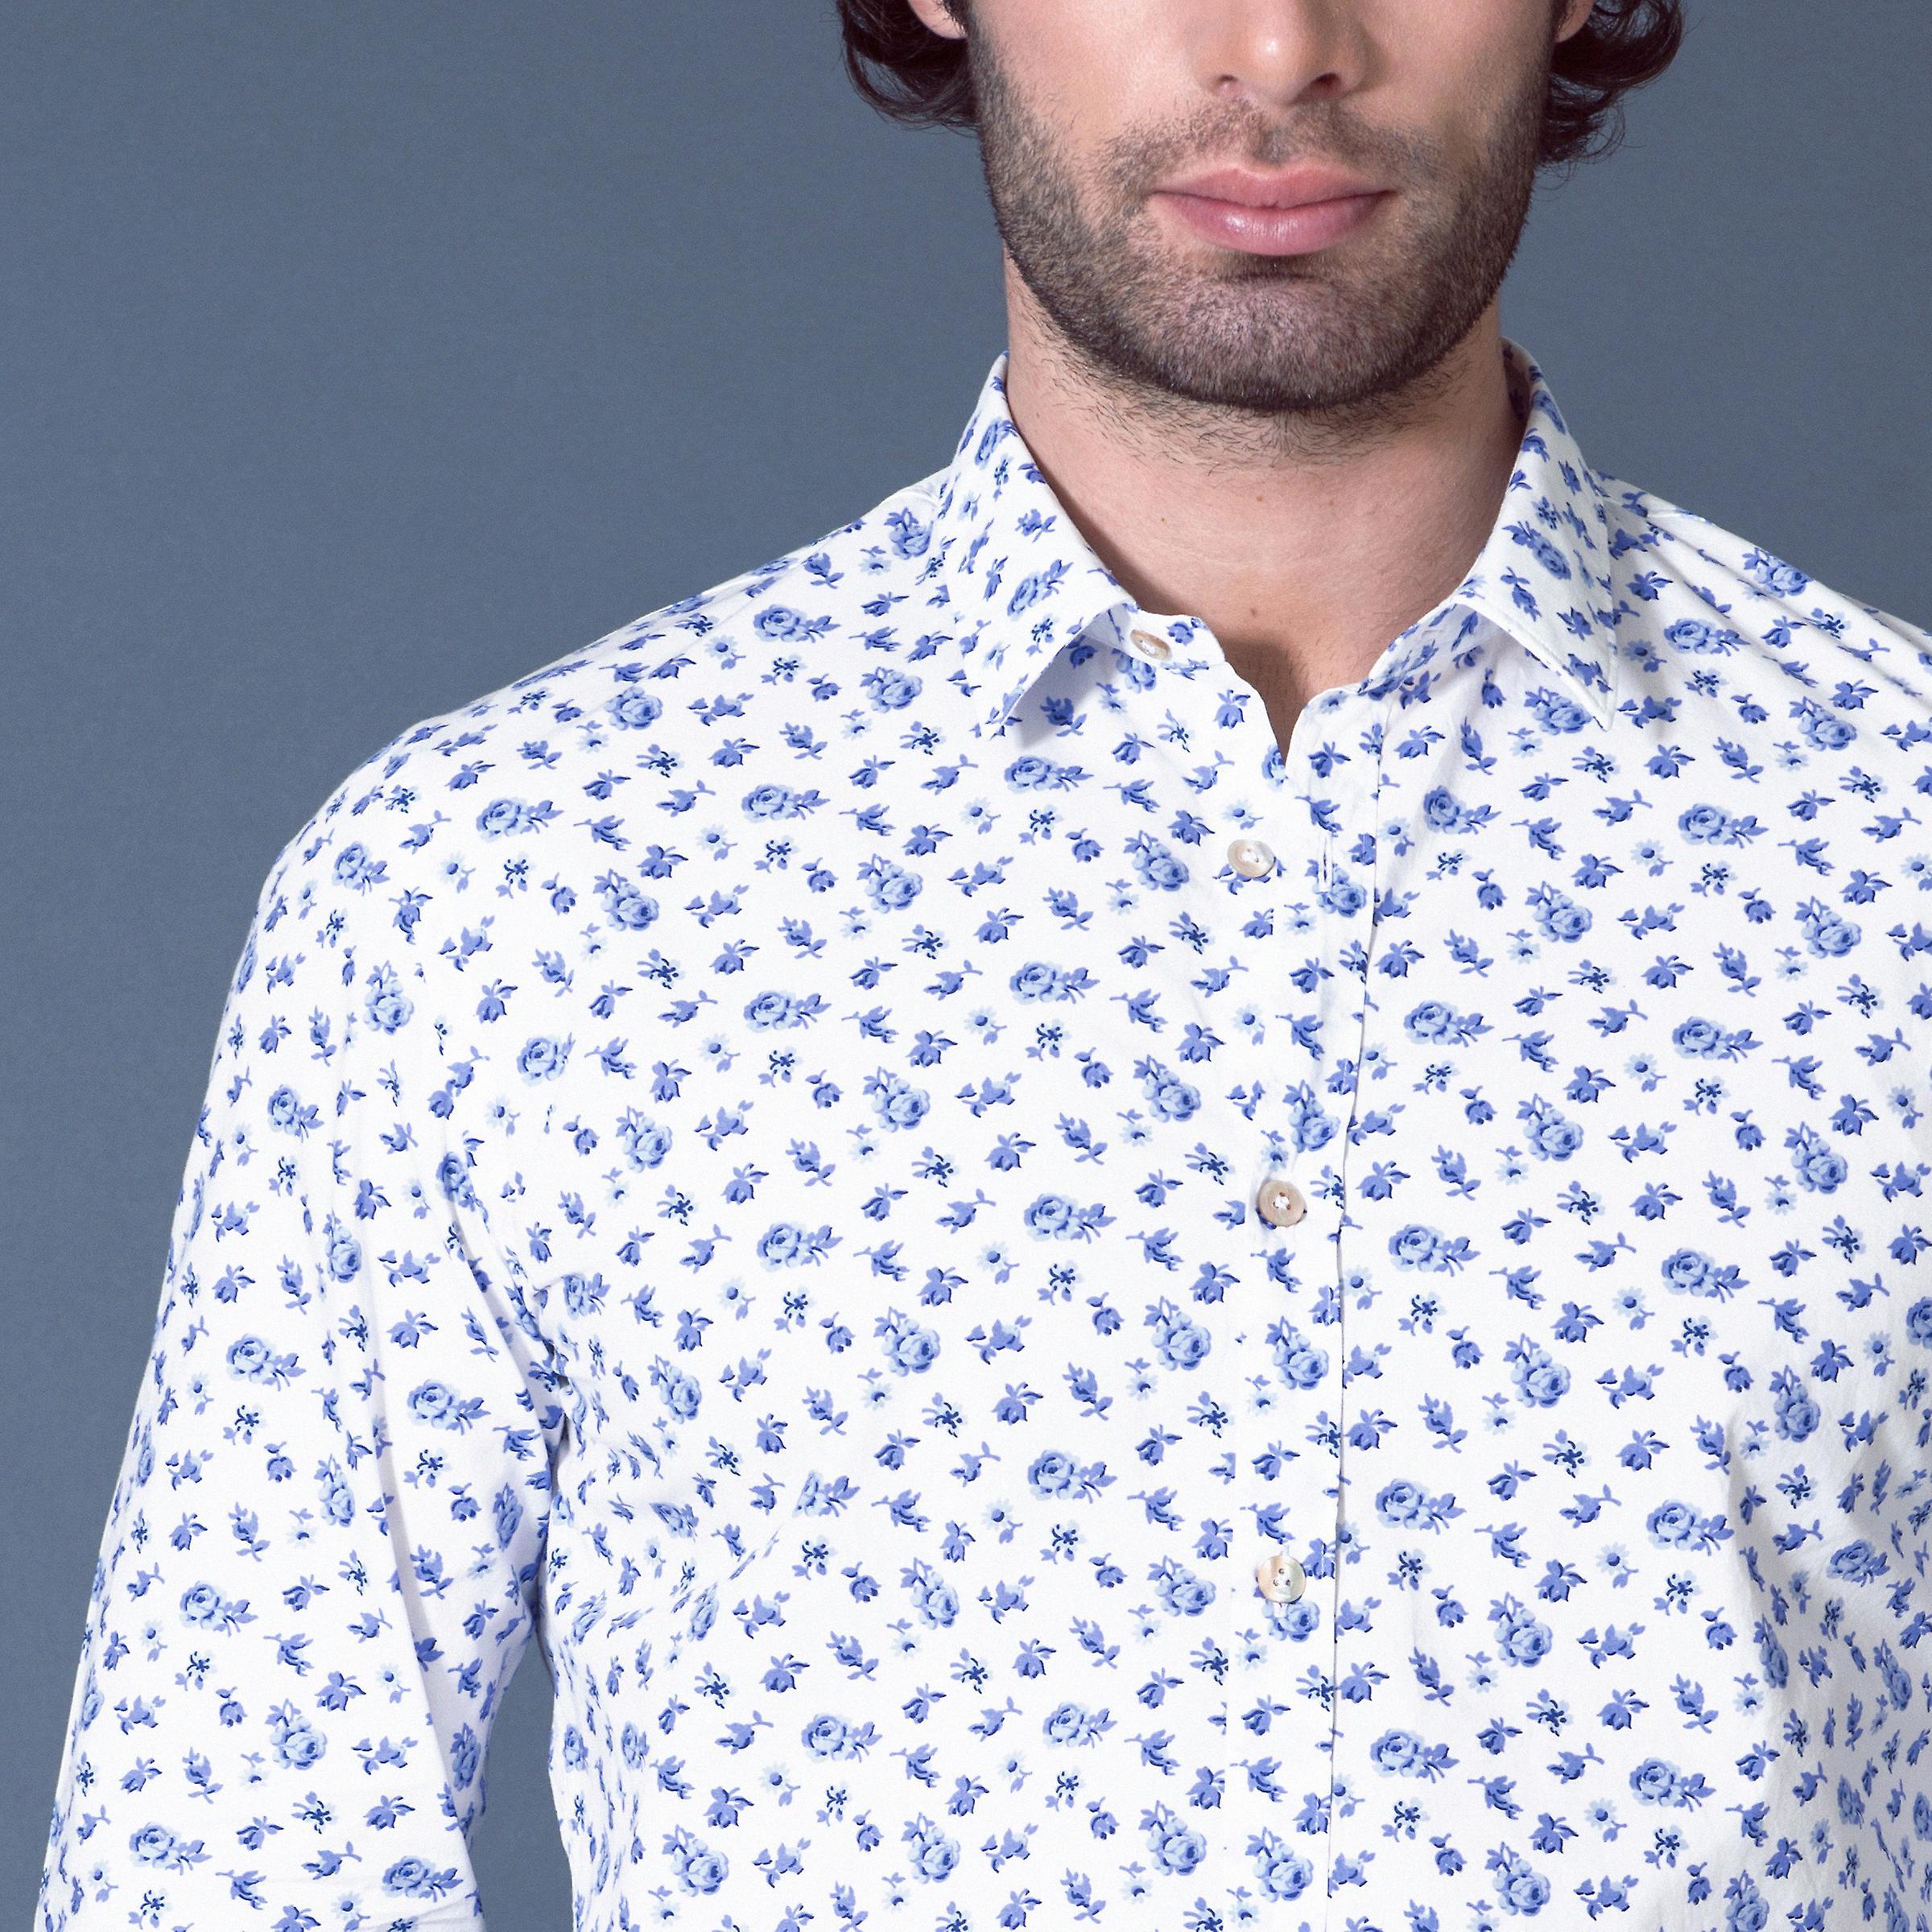 Fabio Giovanni Lorenzo Shirt - Mens Italian Casual Stylish Floral Shirt - Long Sleeve